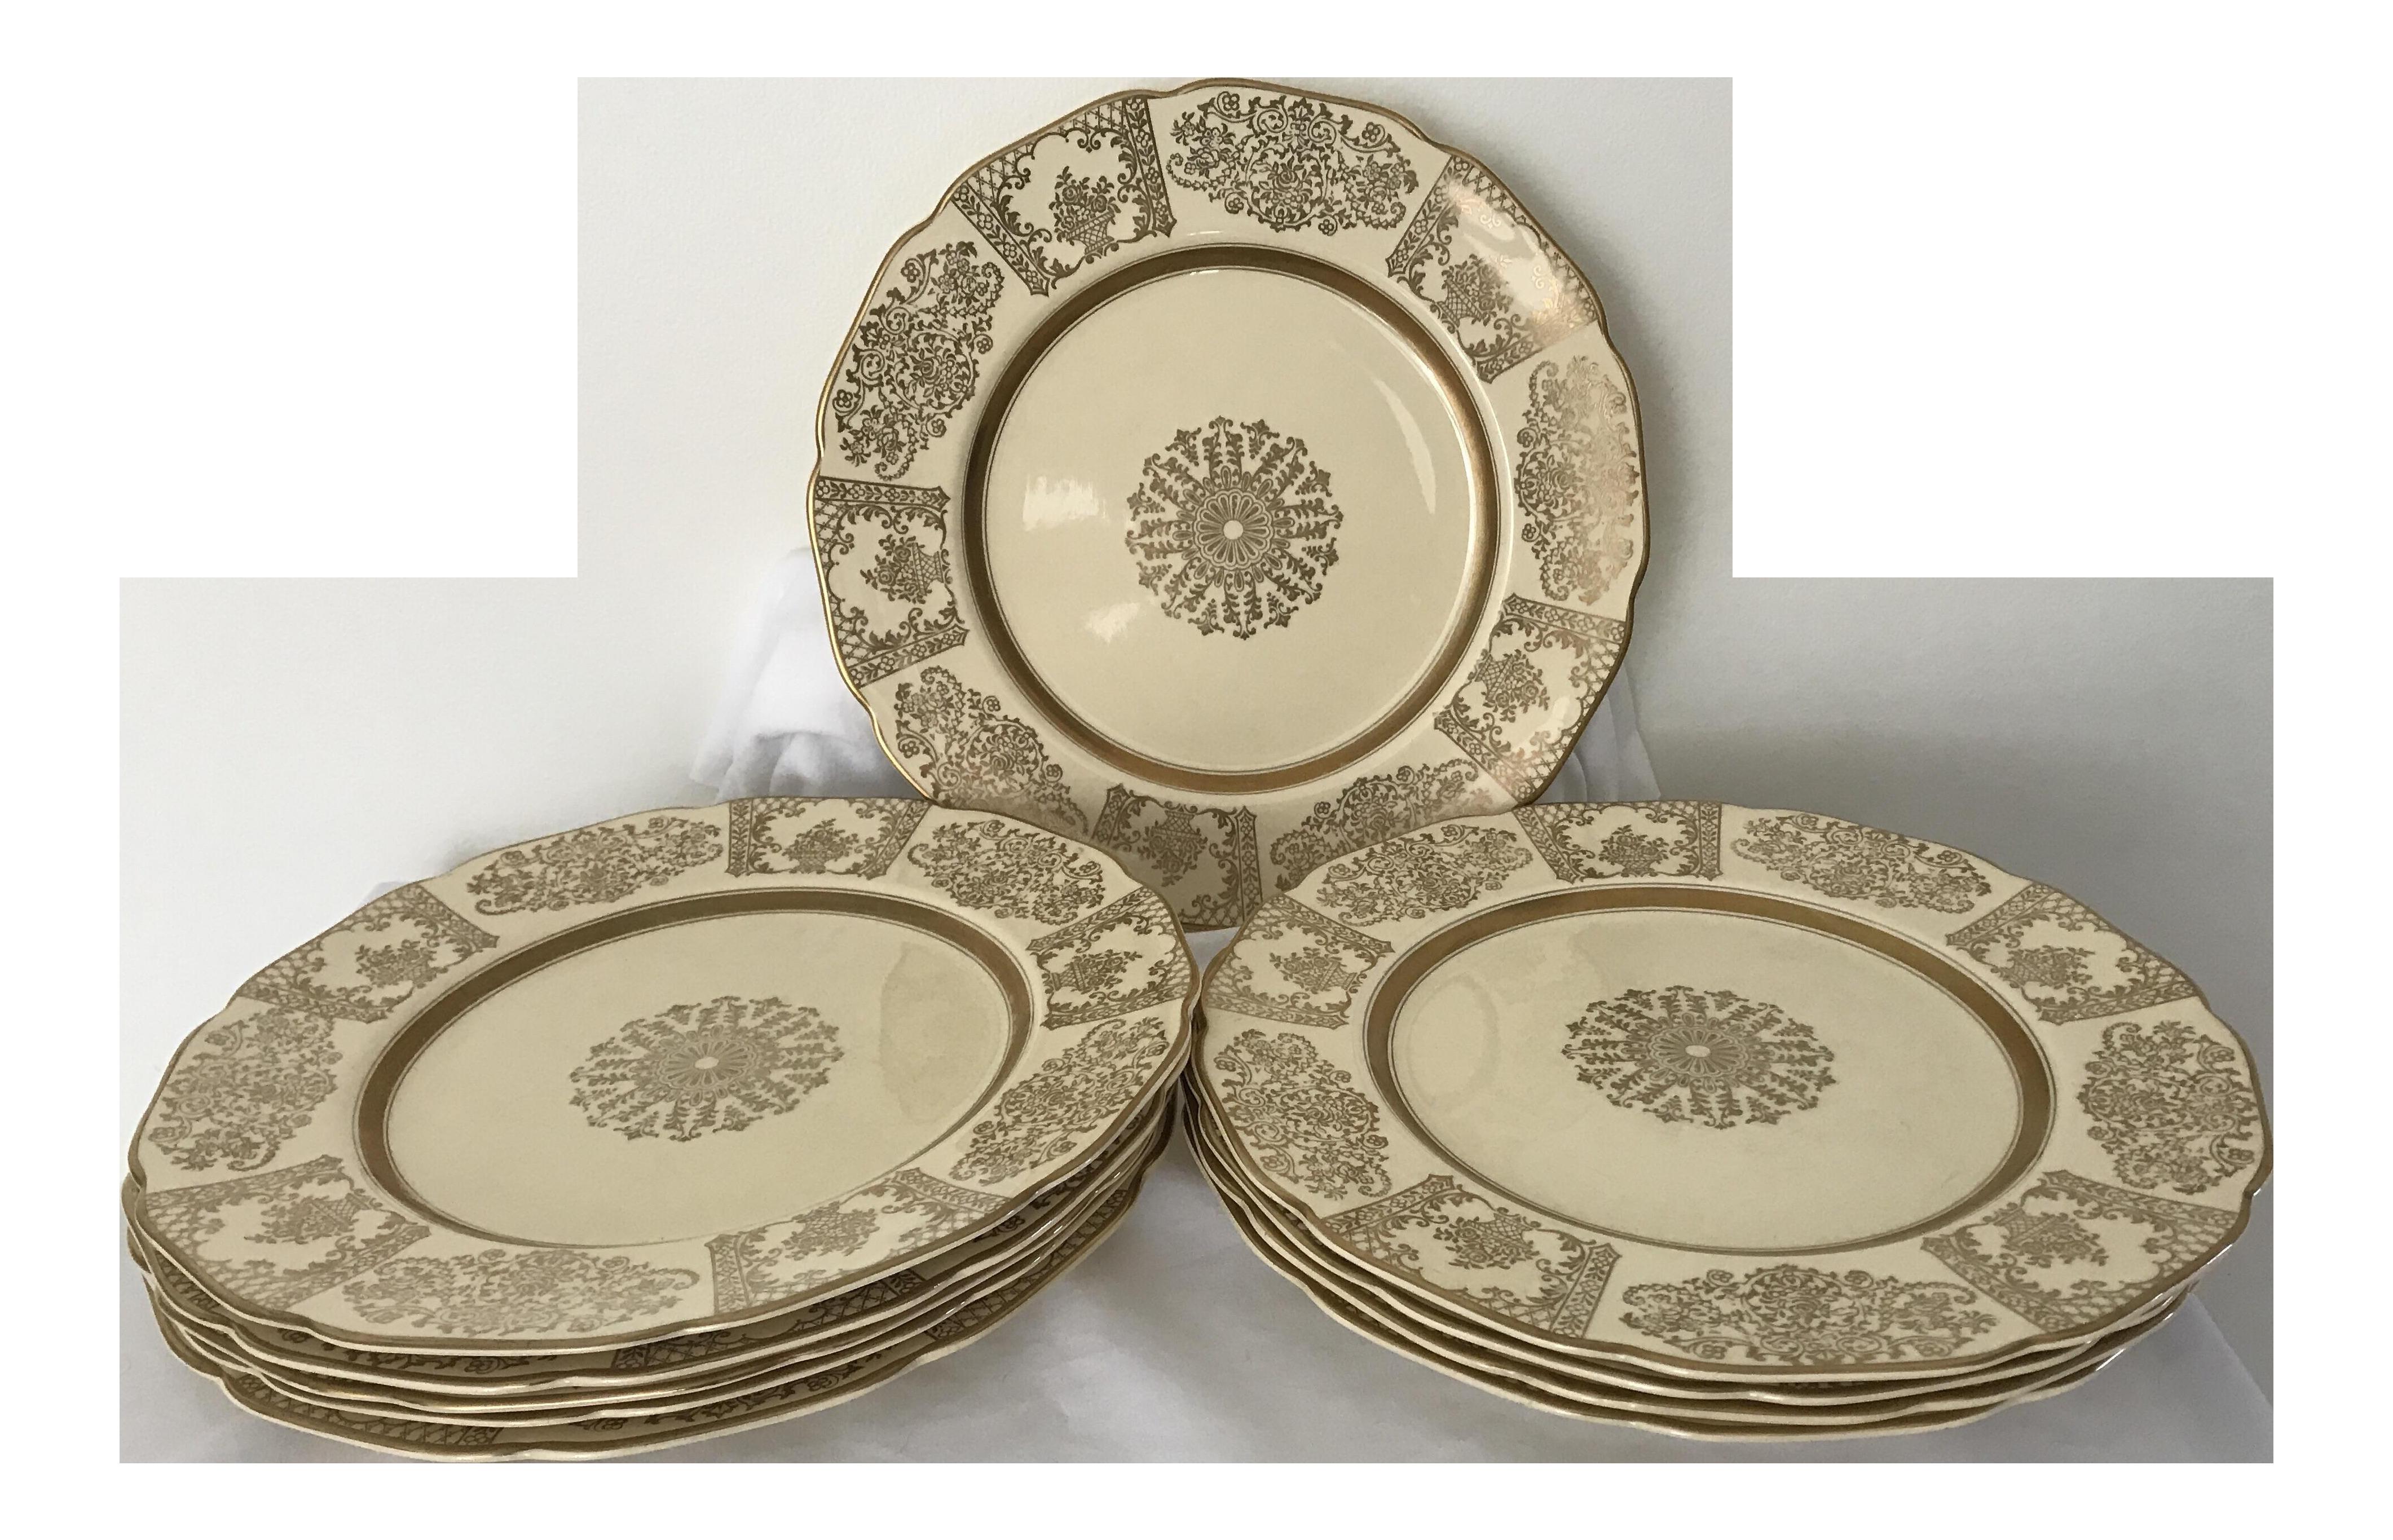 Johnson Bros JB13 Victorian Dinner Plates- Set of 10  sc 1 st  Chairish & Vintage \u0026 Used Victorian Dinnerware | Chairish